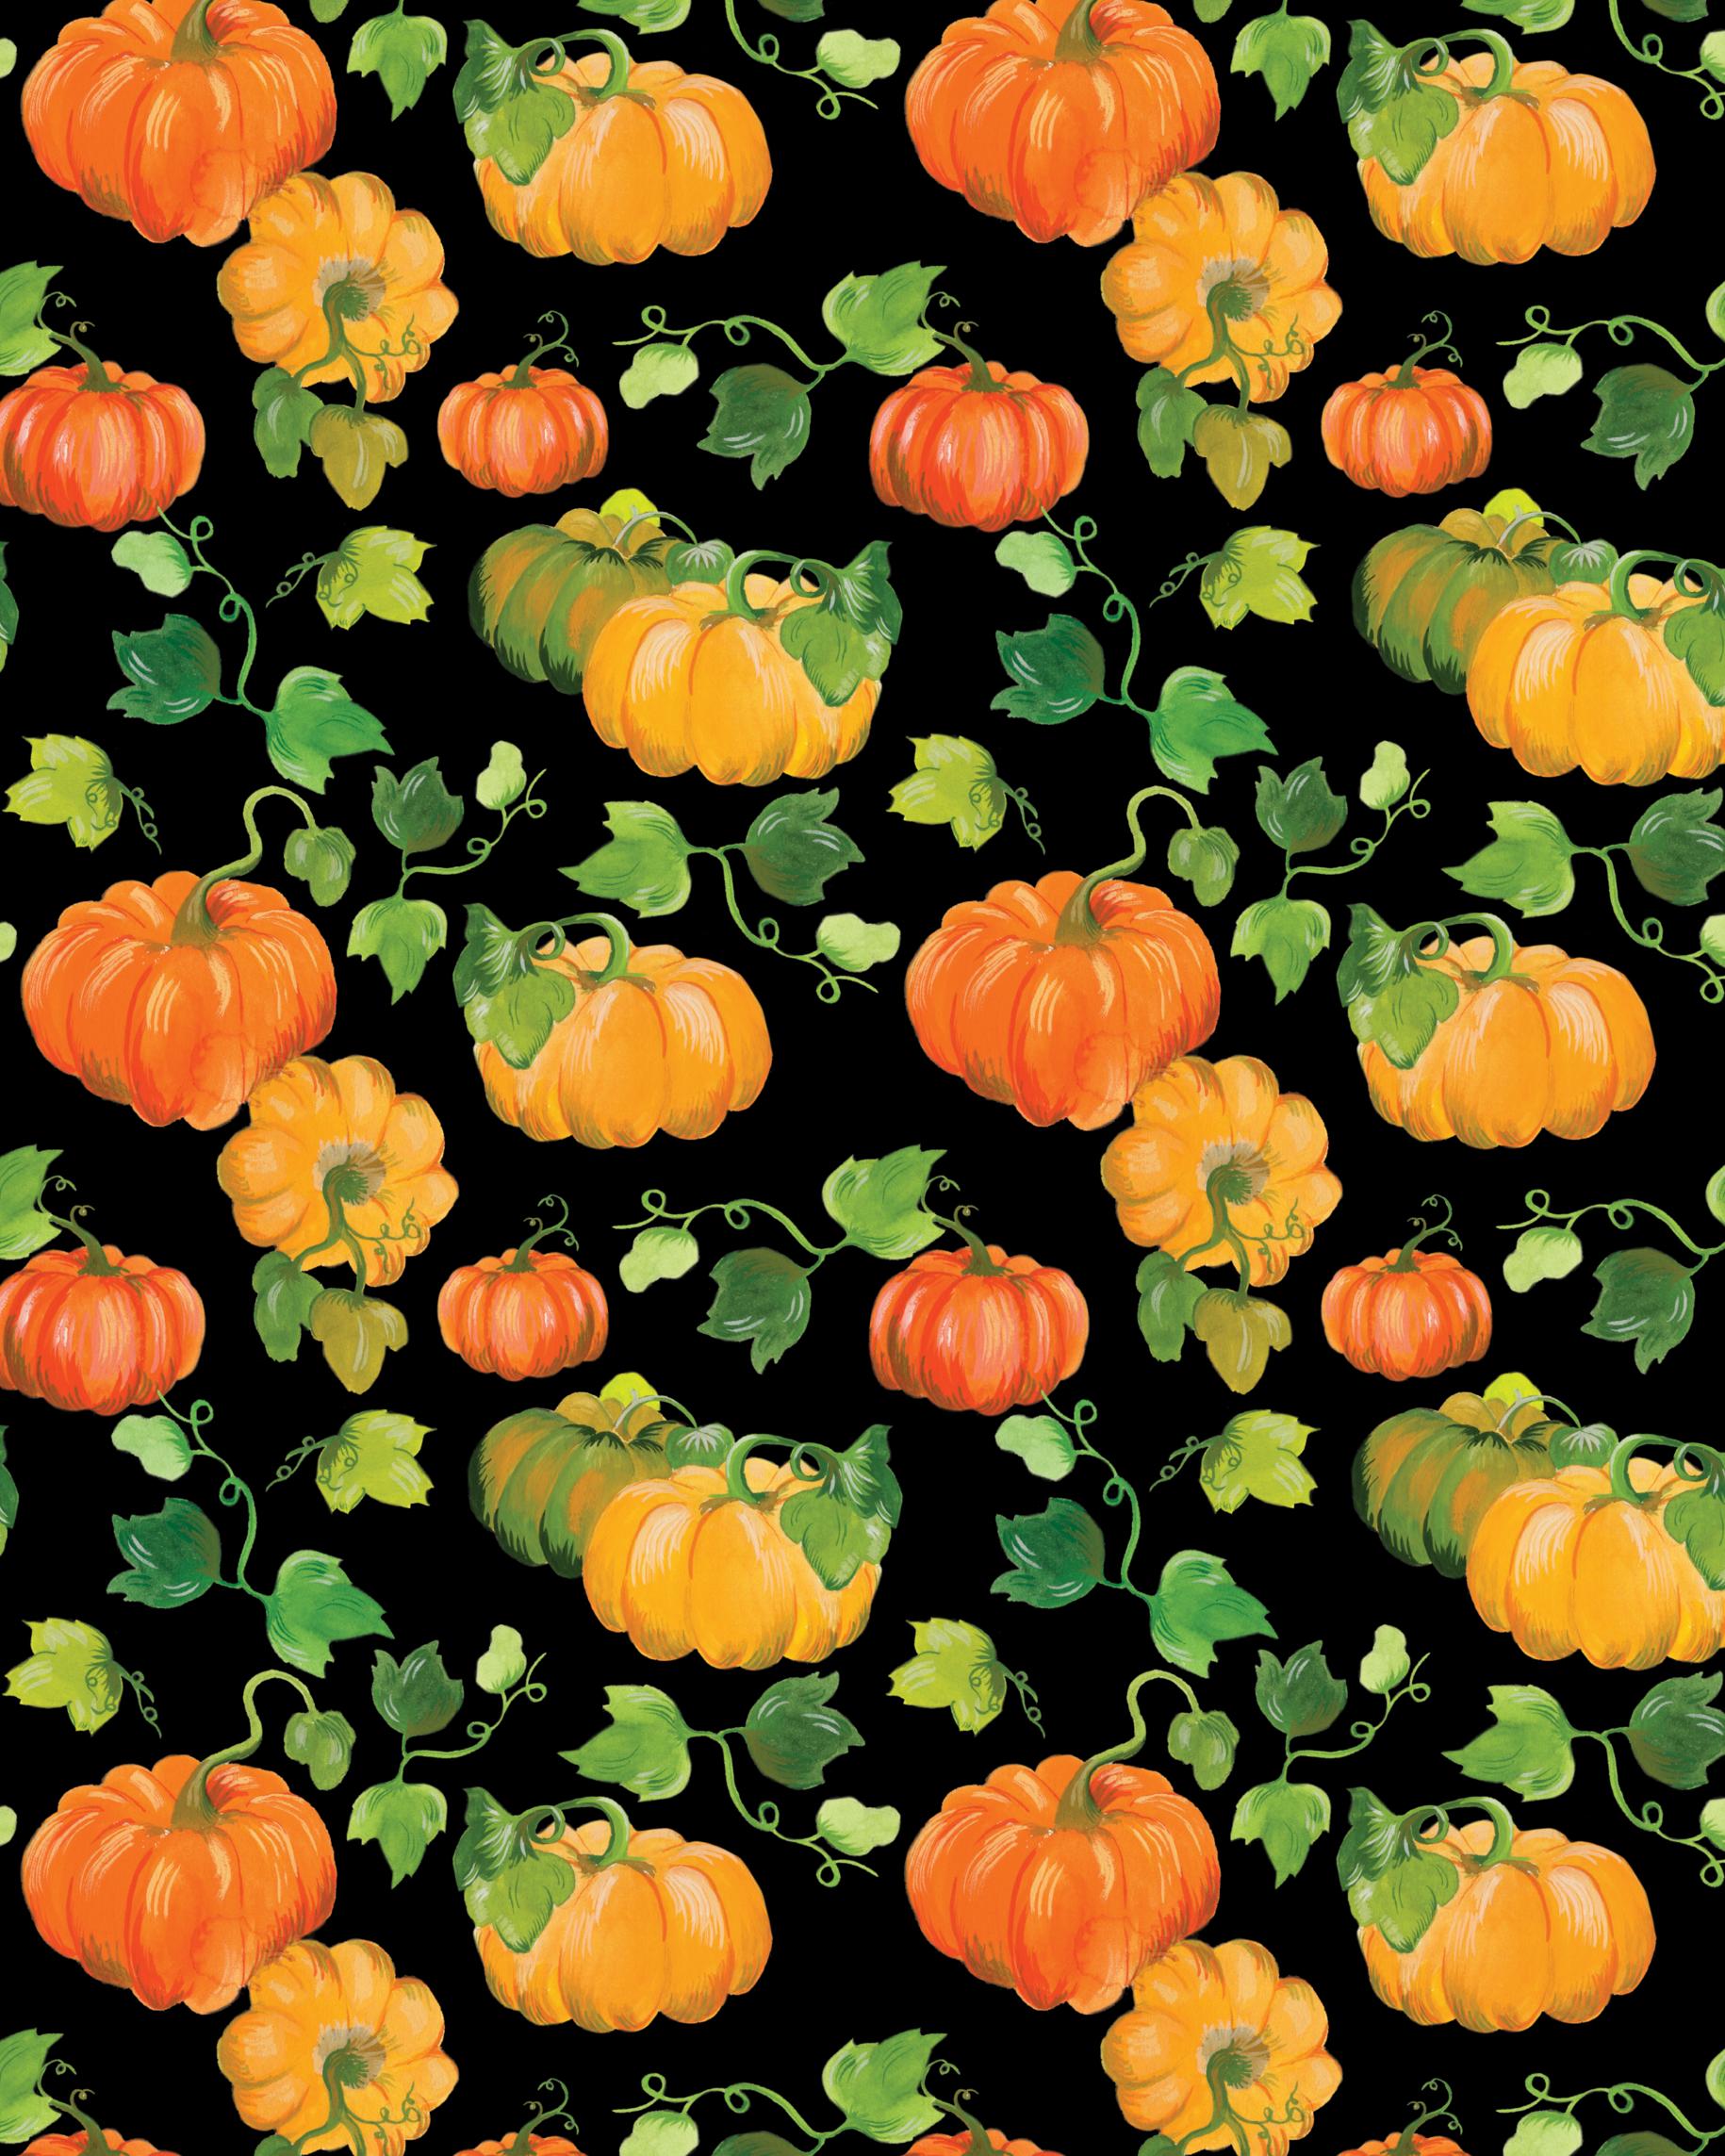 Pumpkin image.png